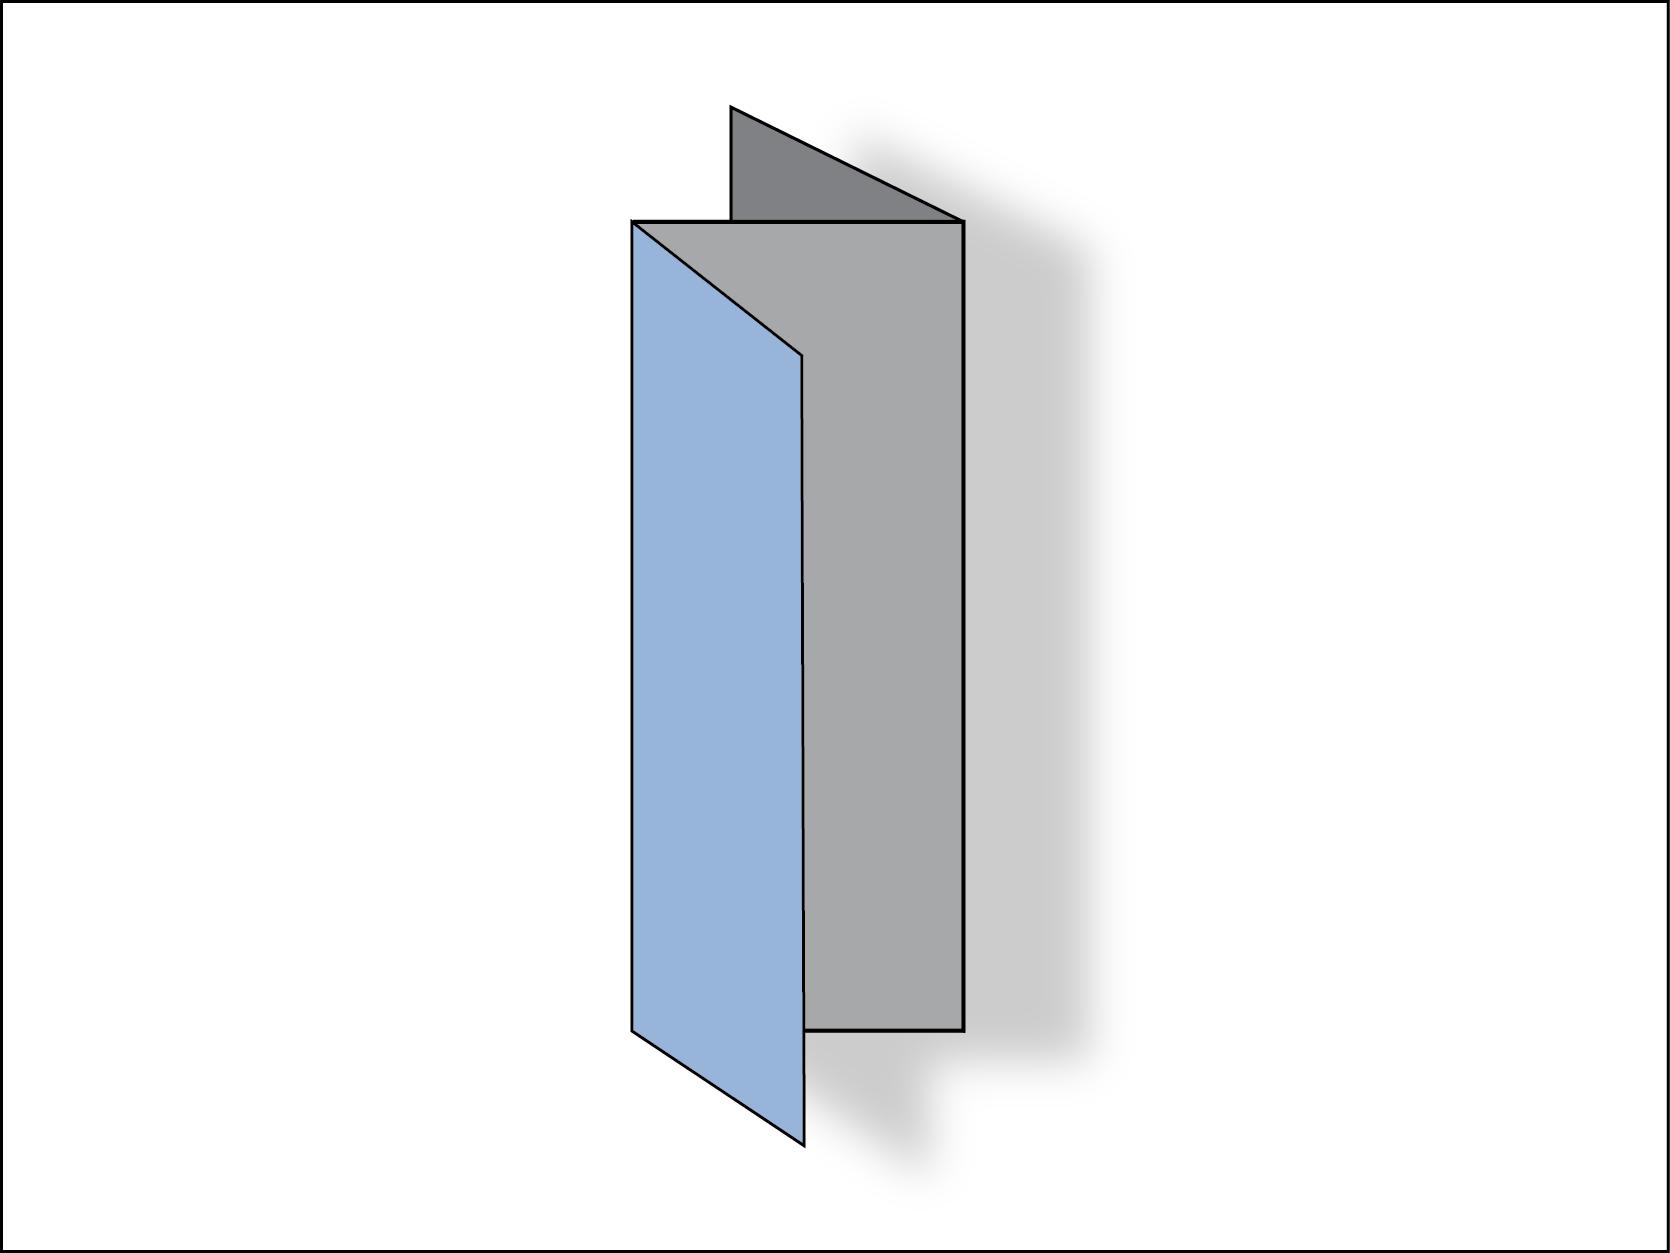 Trifold brochure: accordion fold